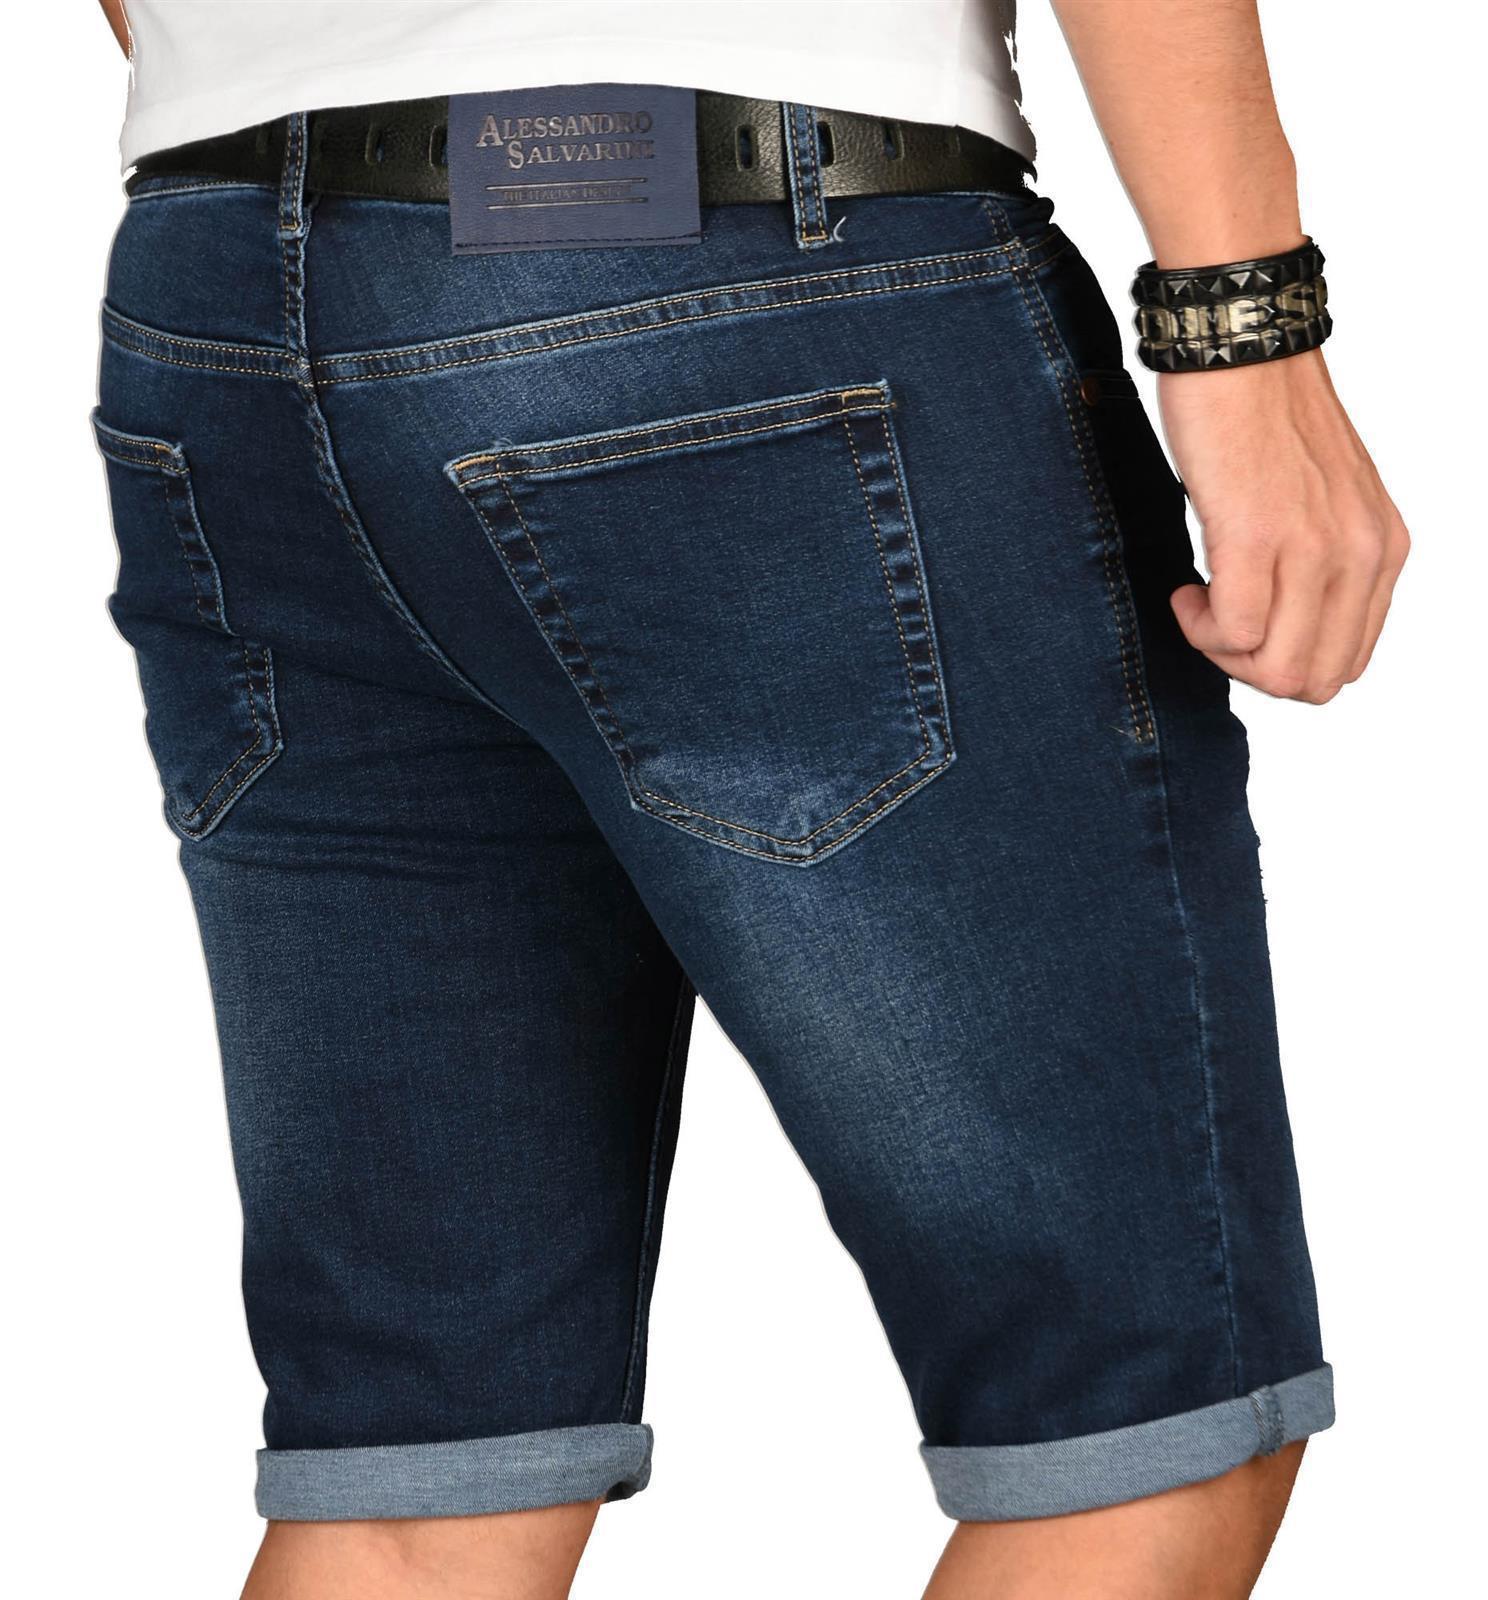 A-Salvarini-Herren-Designer-Jeans-Short-kurze-Hose-Slim-Sommer-Shorts-Washed Indexbild 36